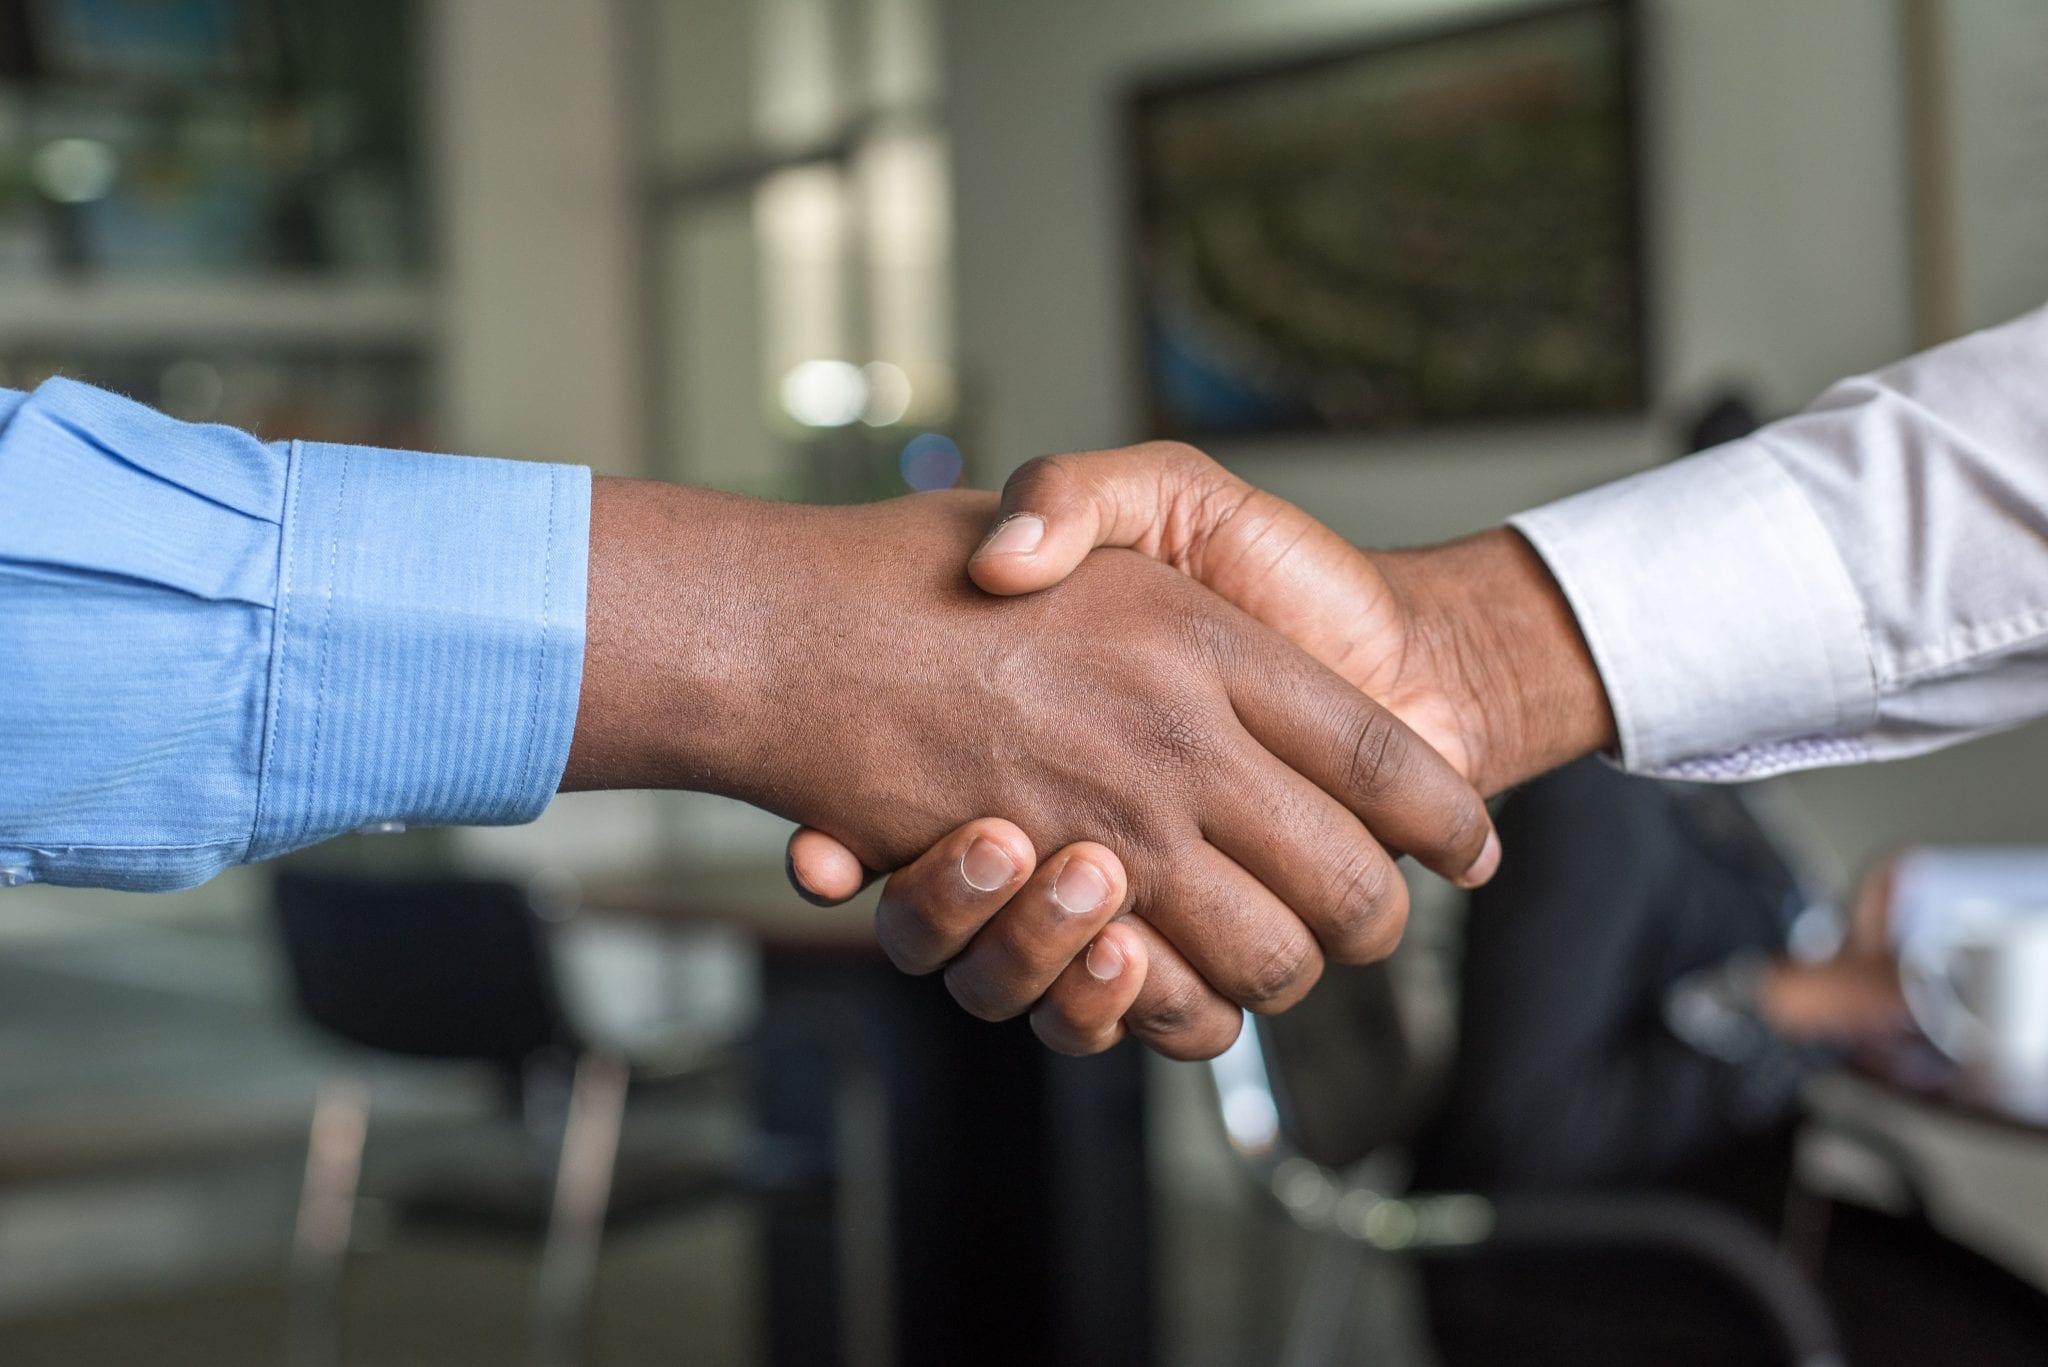 Vendre son bien immobilier : agence vs particuliers